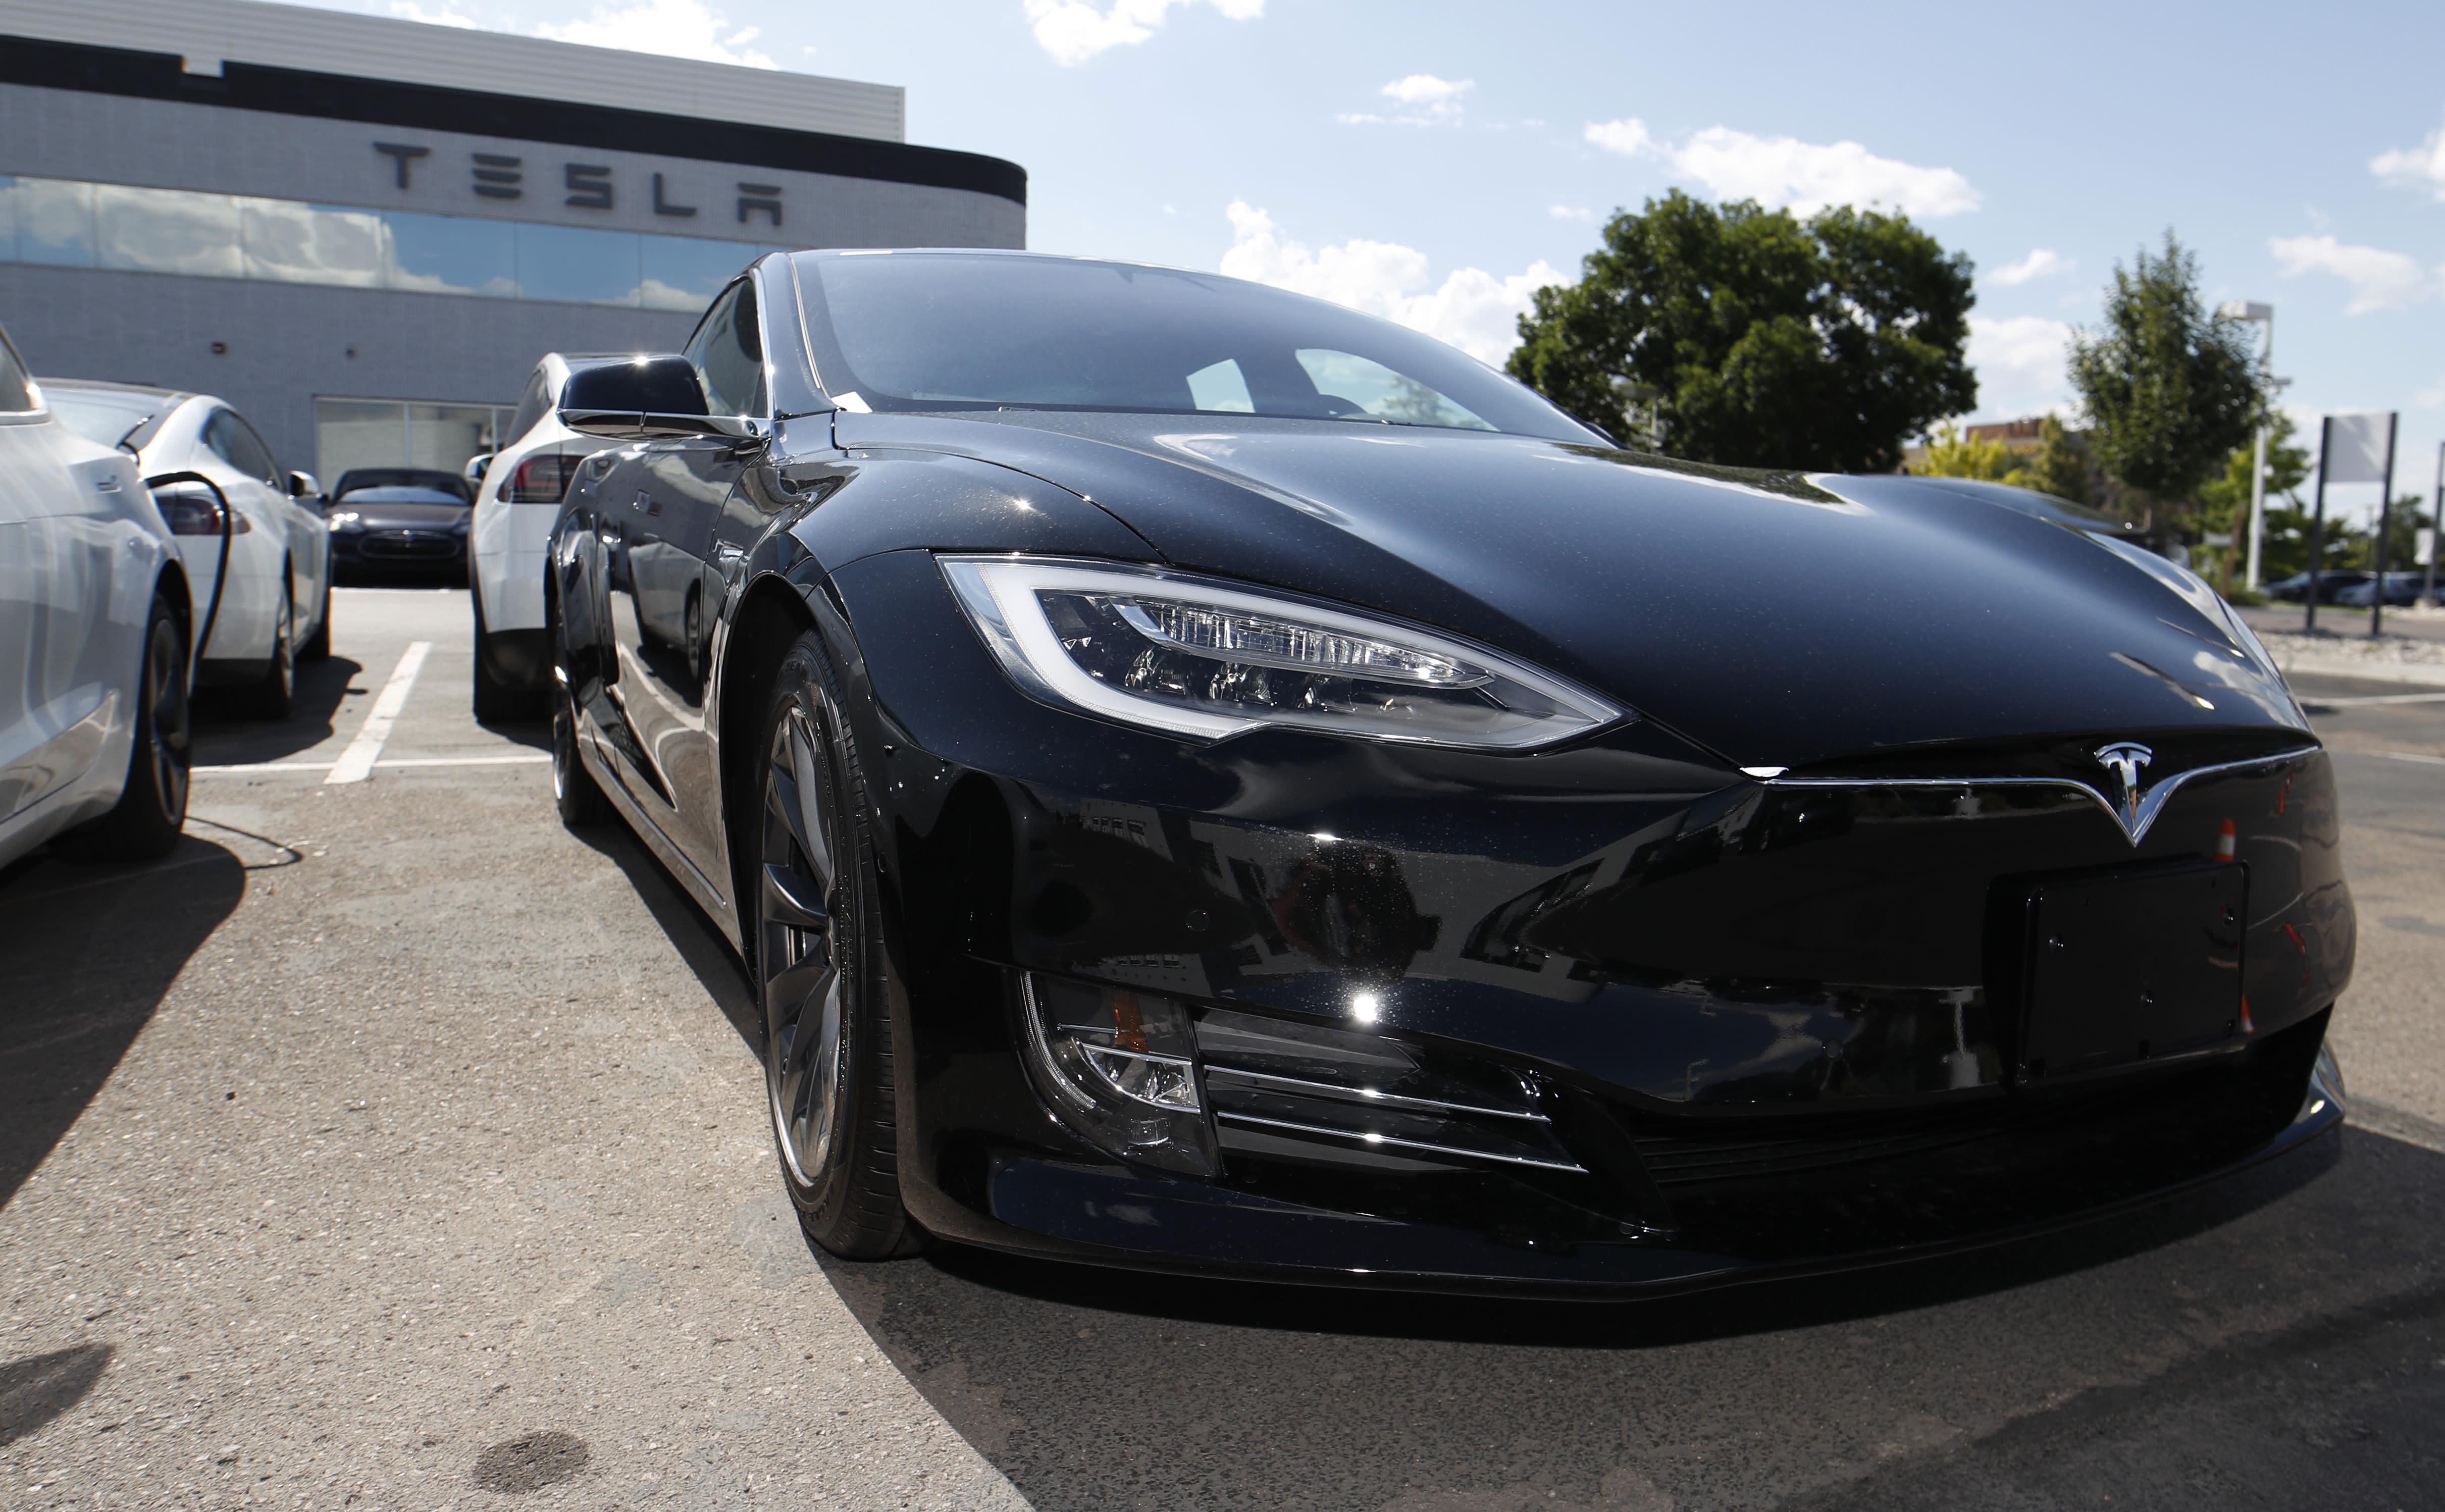 Tesla autopilot under scrutiny after accidents